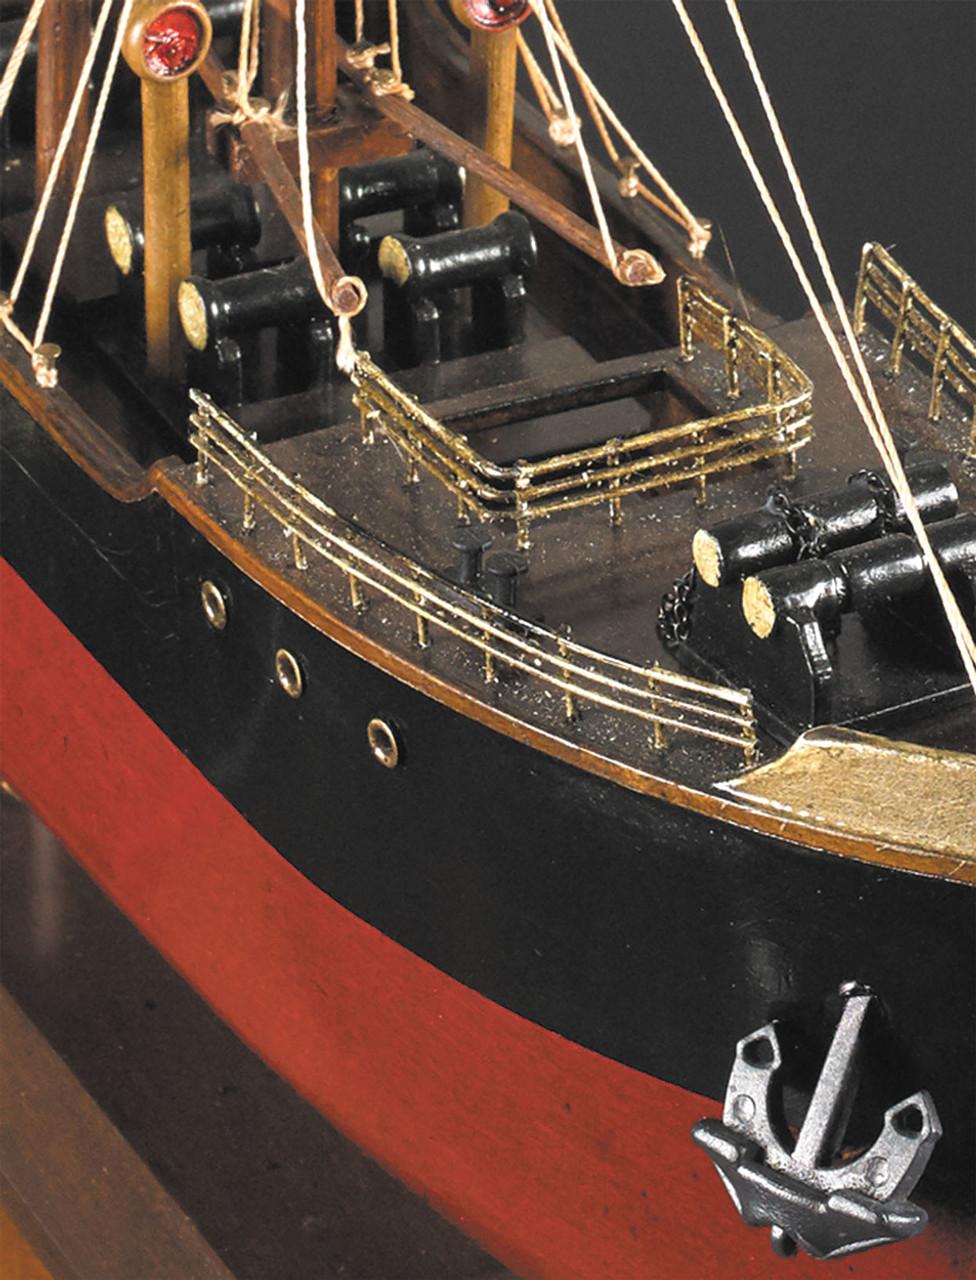 1897 Malacca Tramp Steamer Wooden Cargo Ship Model 26 75